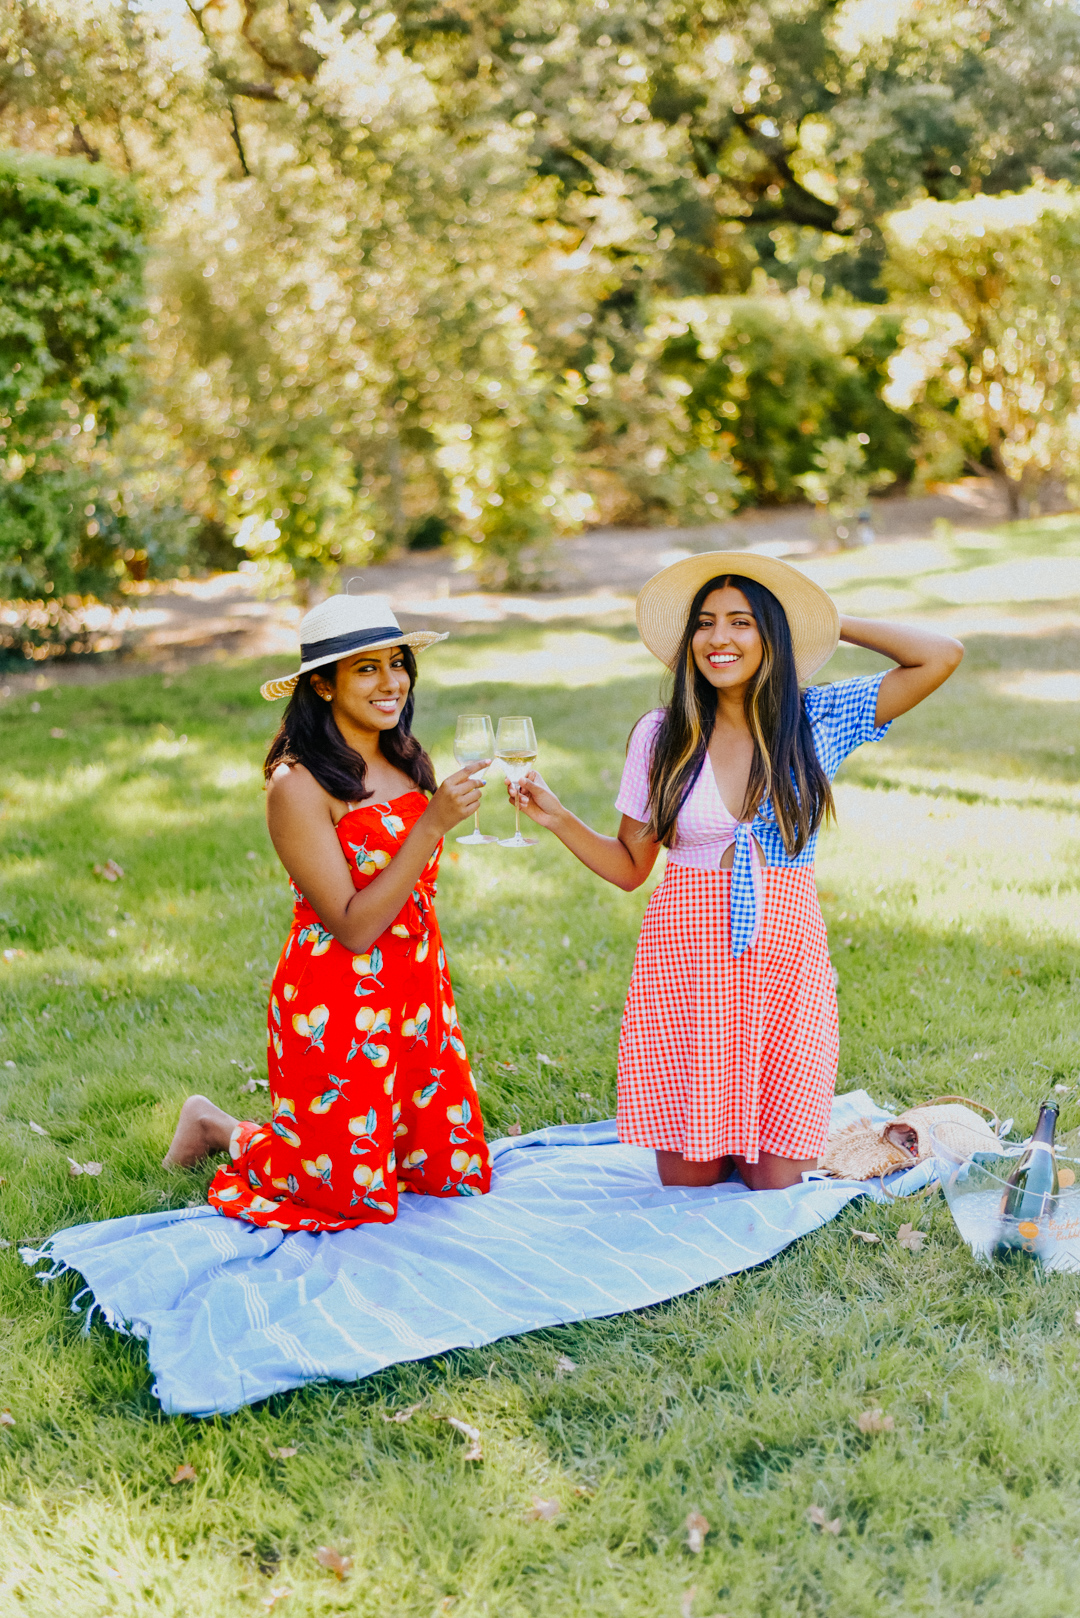 Napa-valley-roadtrip-california-sisters-summer 7